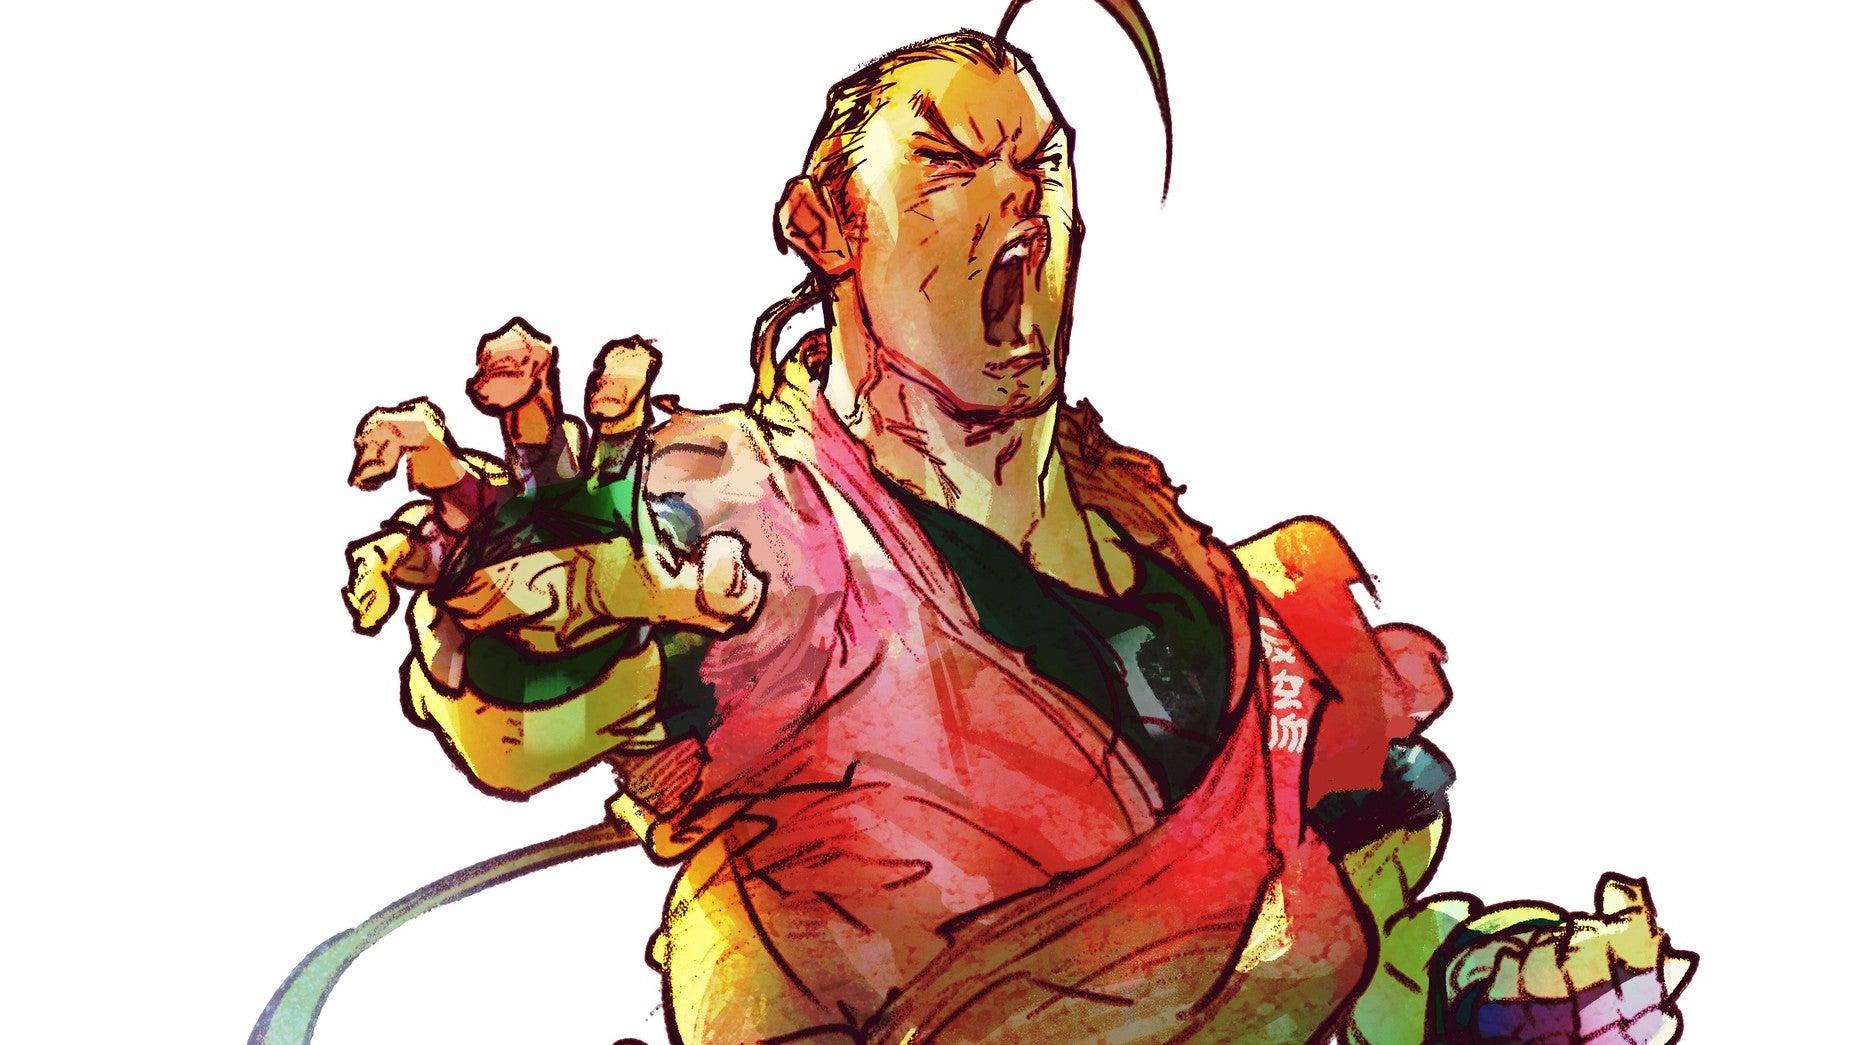 Image for Dan arrives in Street Fighter 5 in February 2021